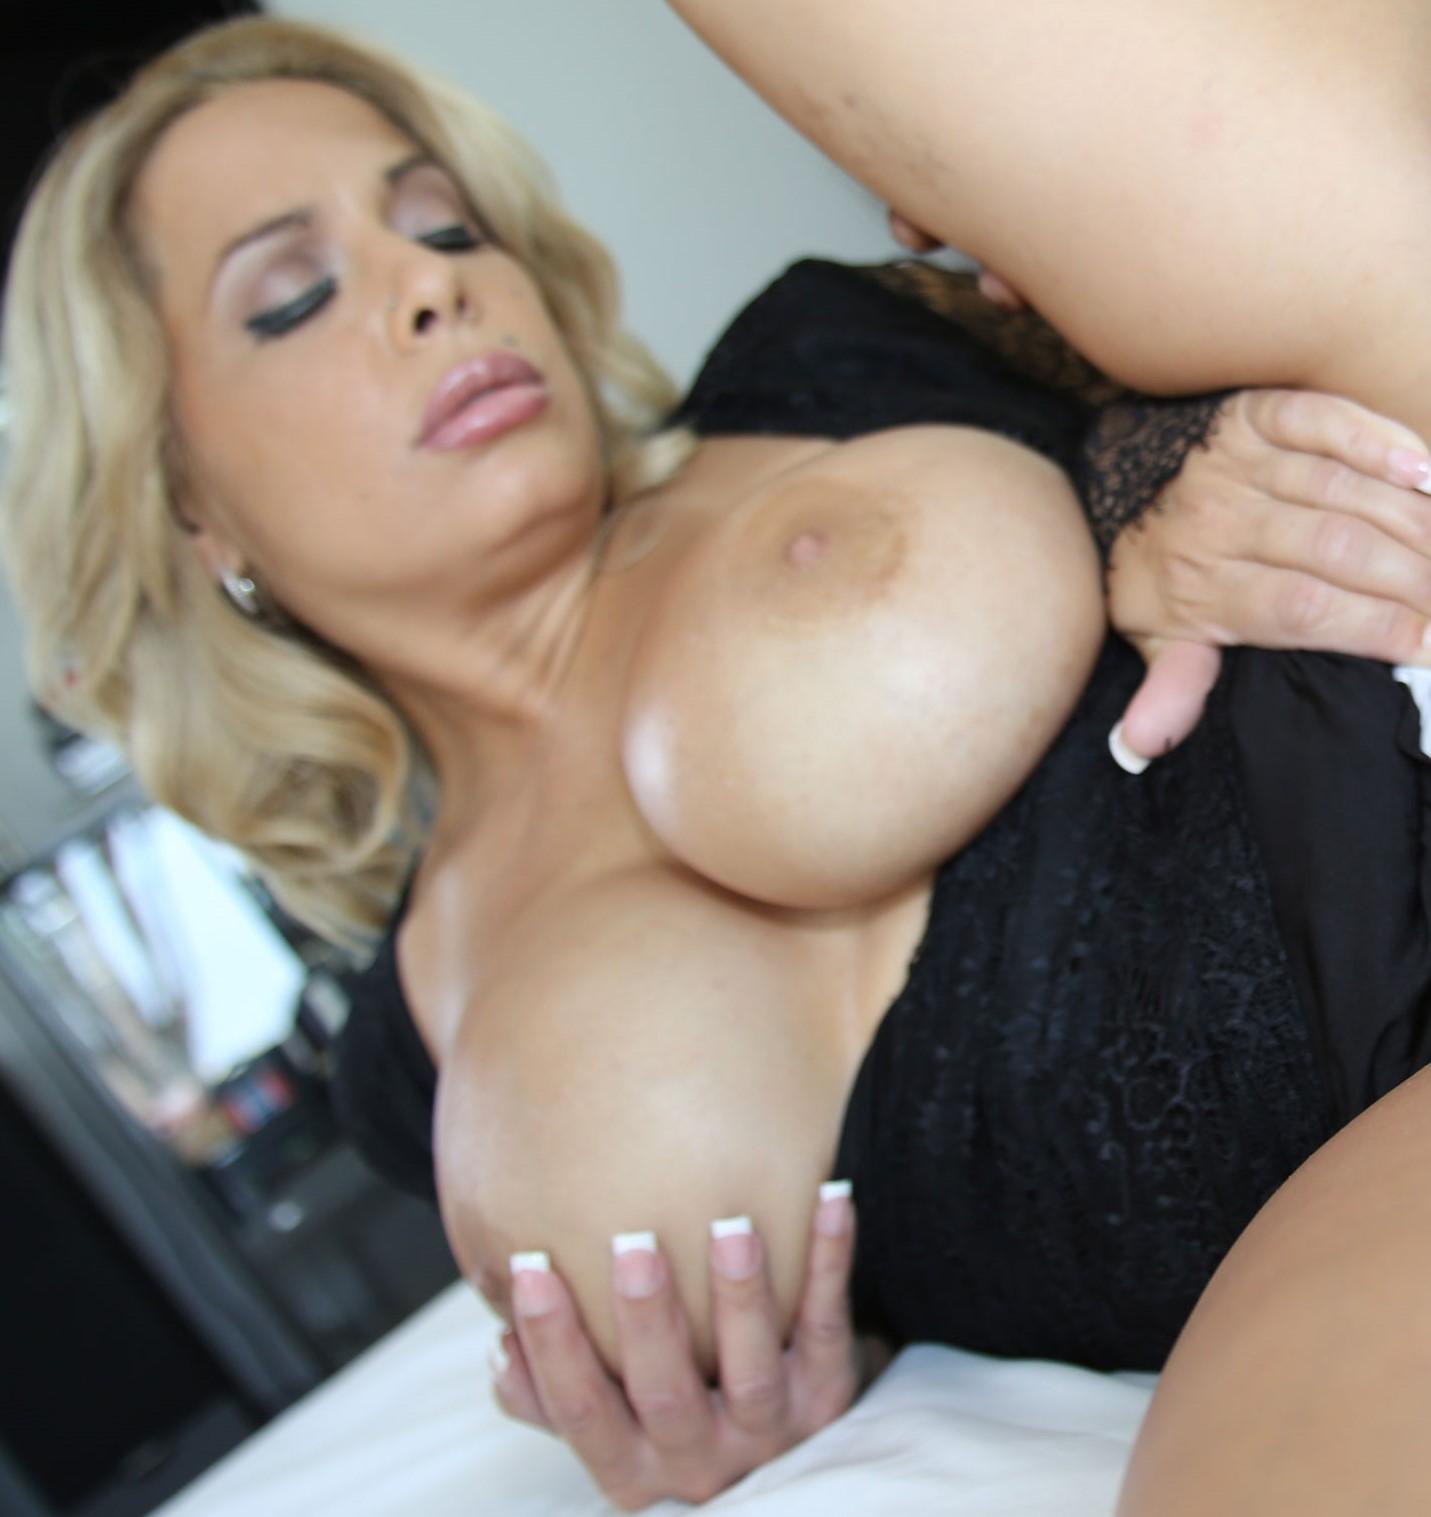 polla negra video porno fernanda lima